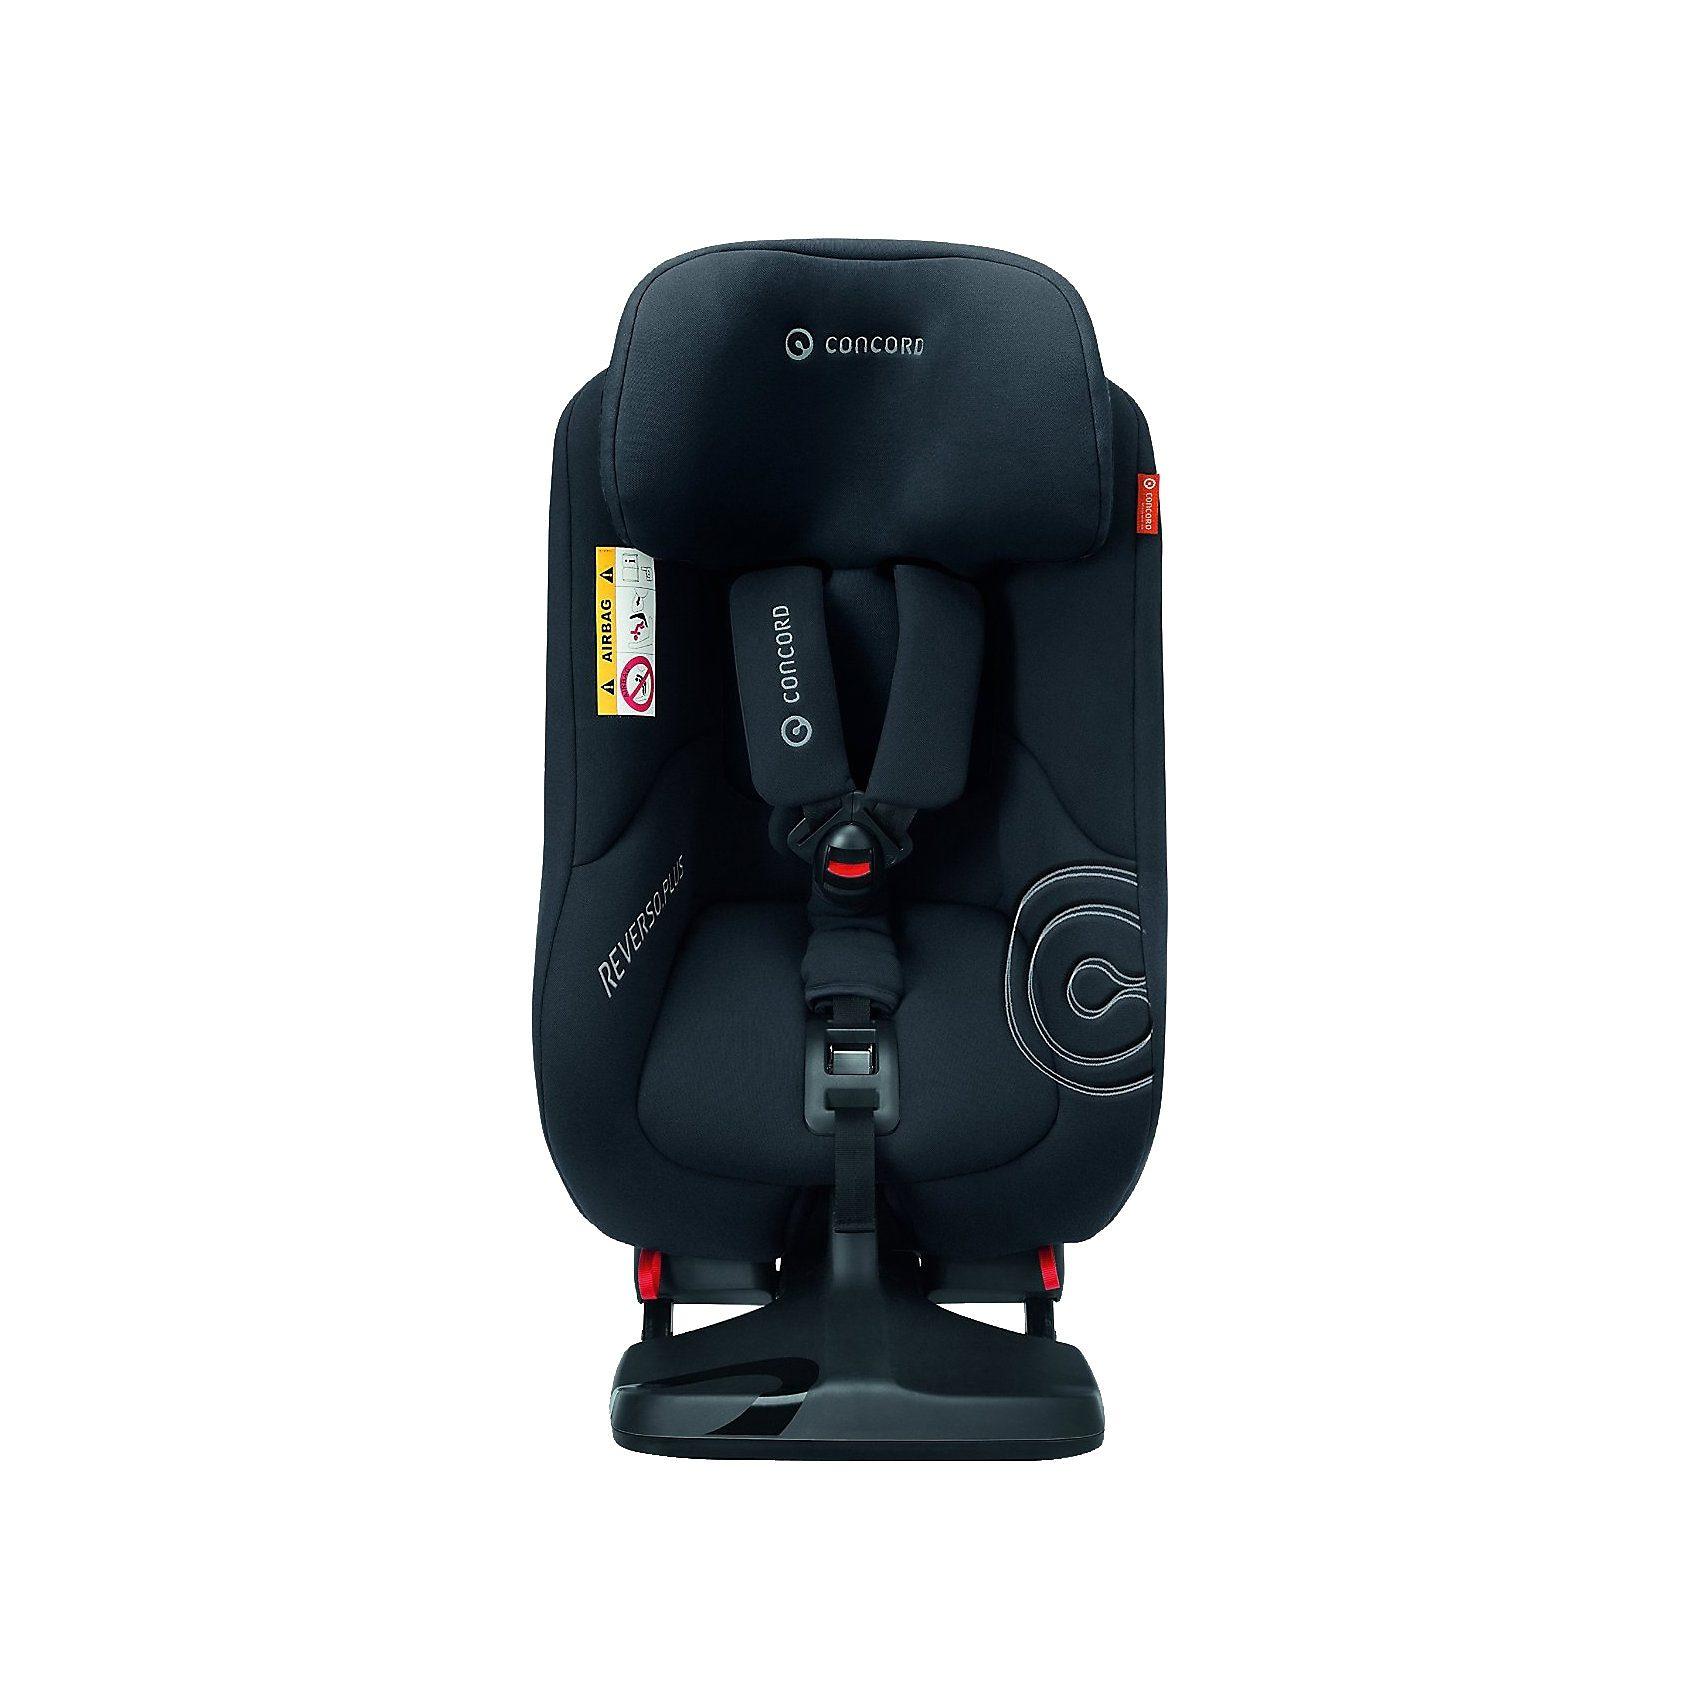 Concord Auto-Kindersitz Reverso Plus, Midnight Black, 2016